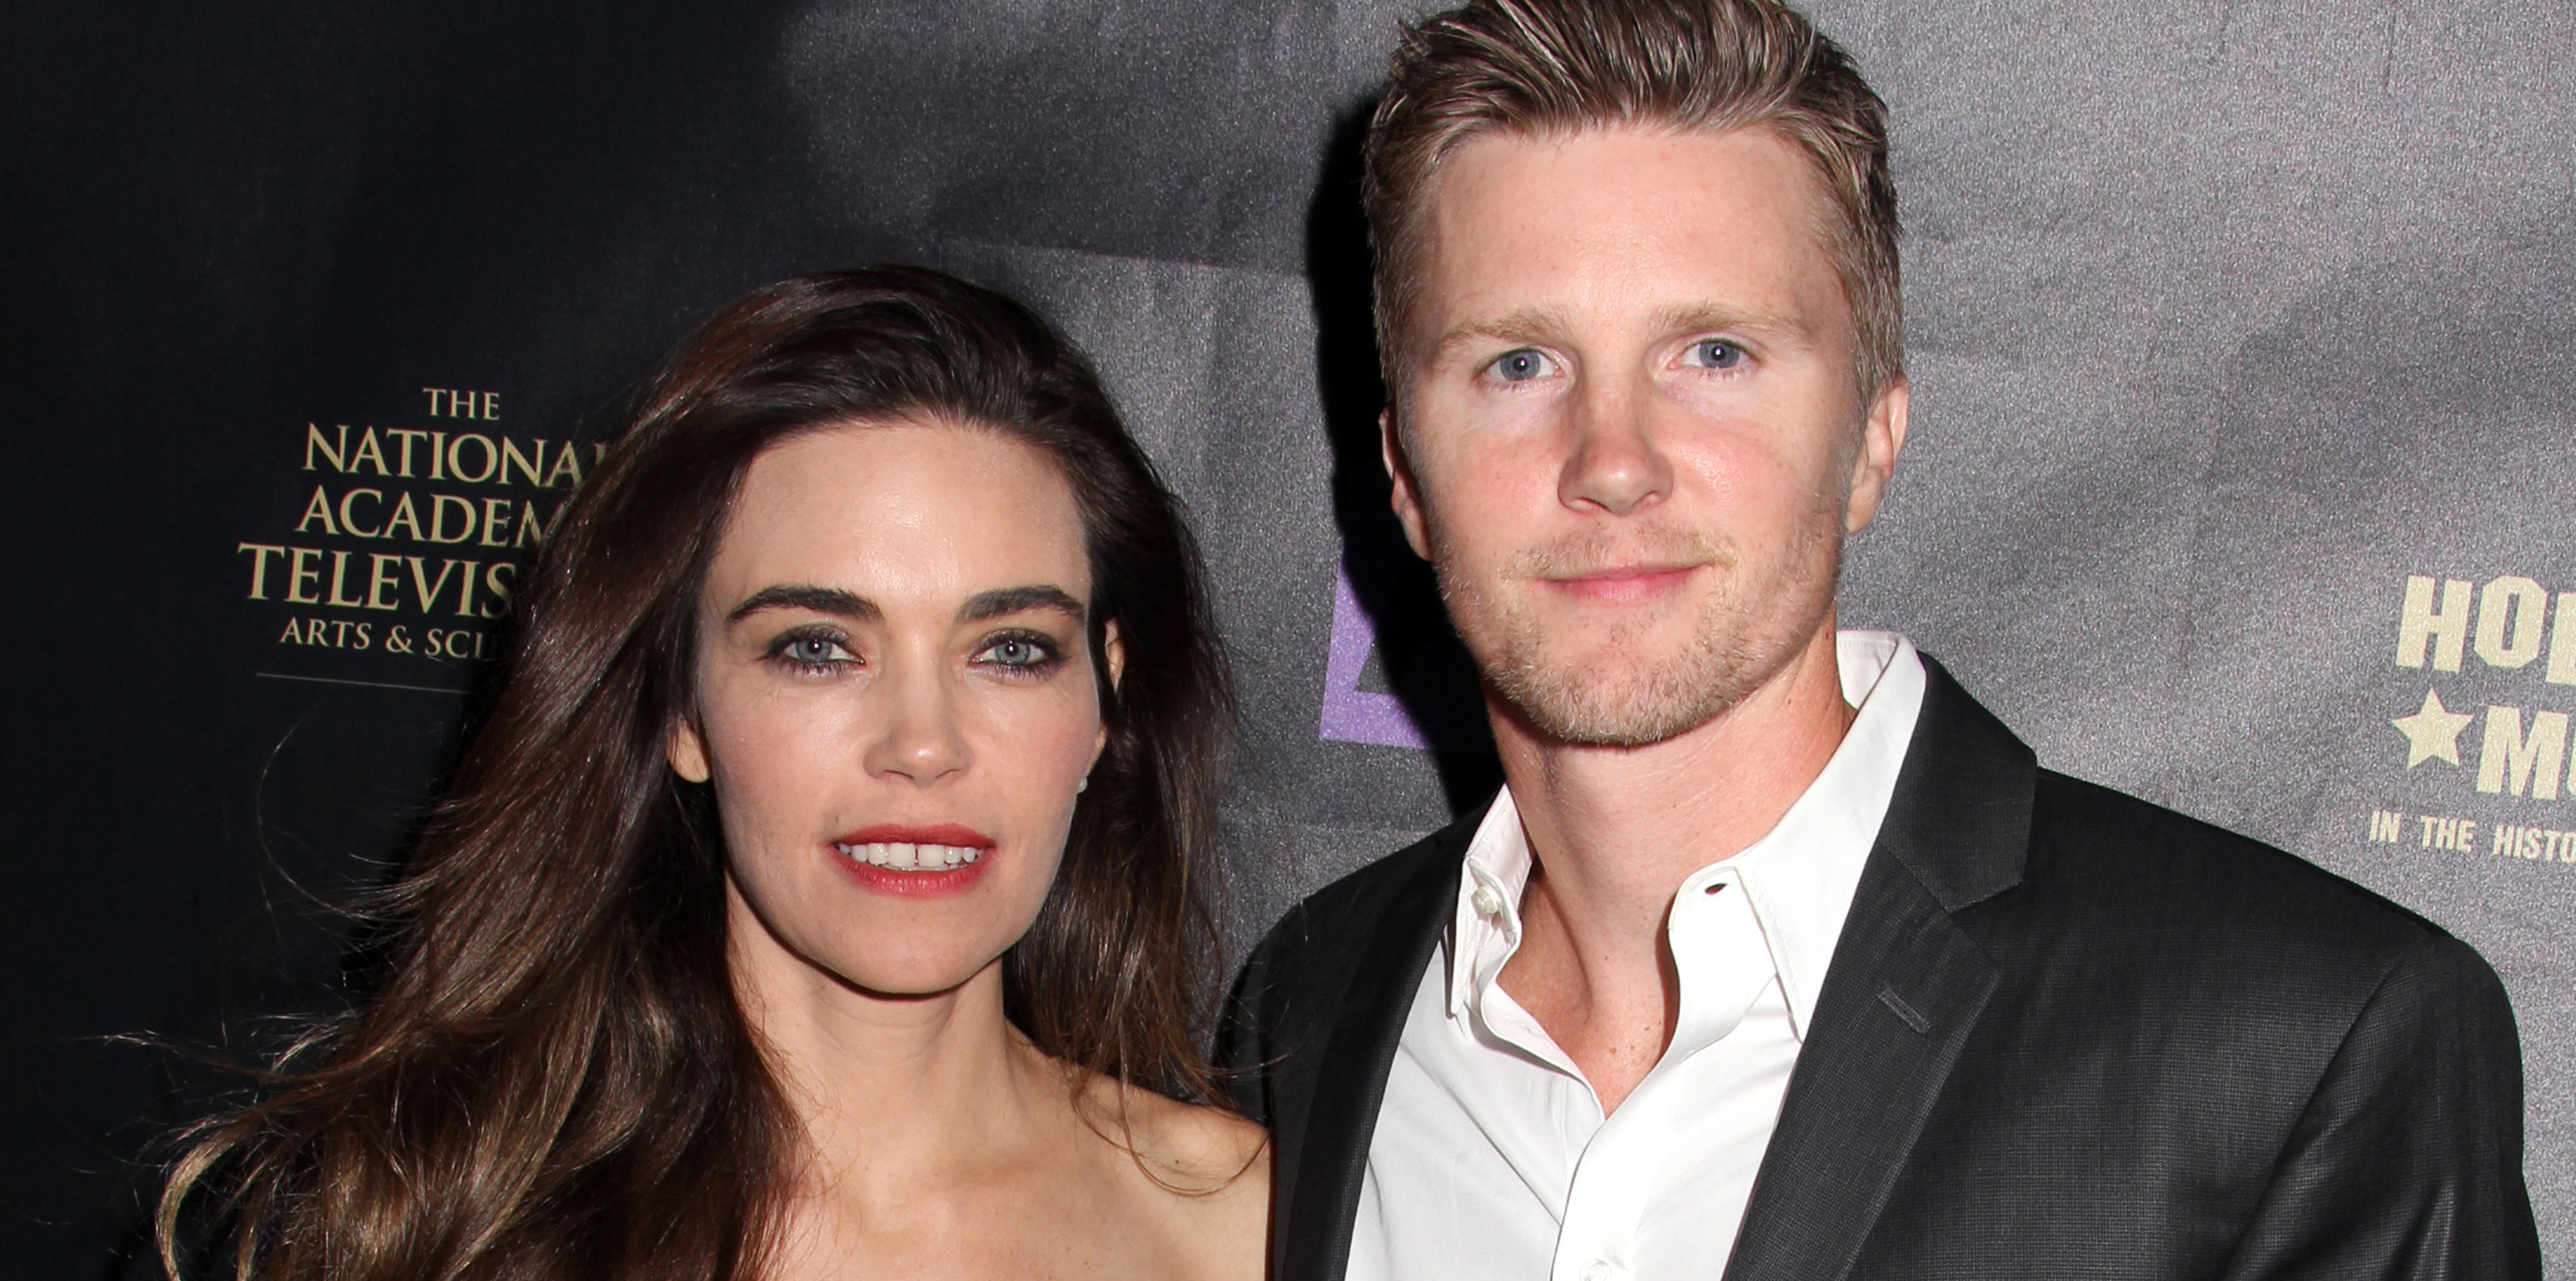 Soap opera stars dating real life